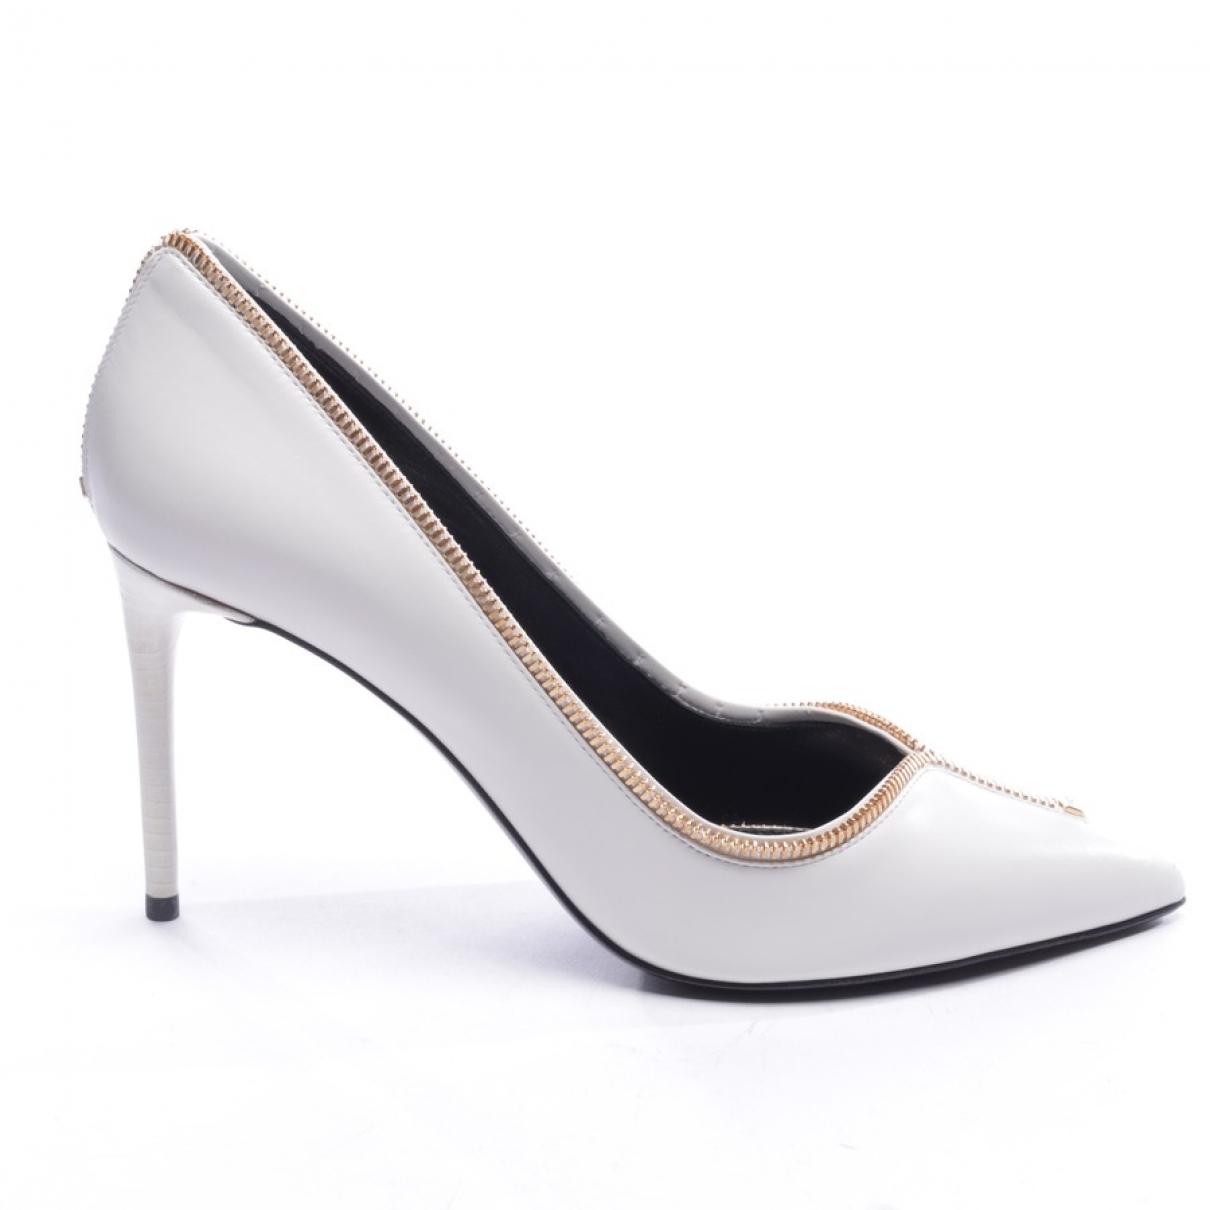 Tom Ford - Escarpins   pour femme en cuir - blanc